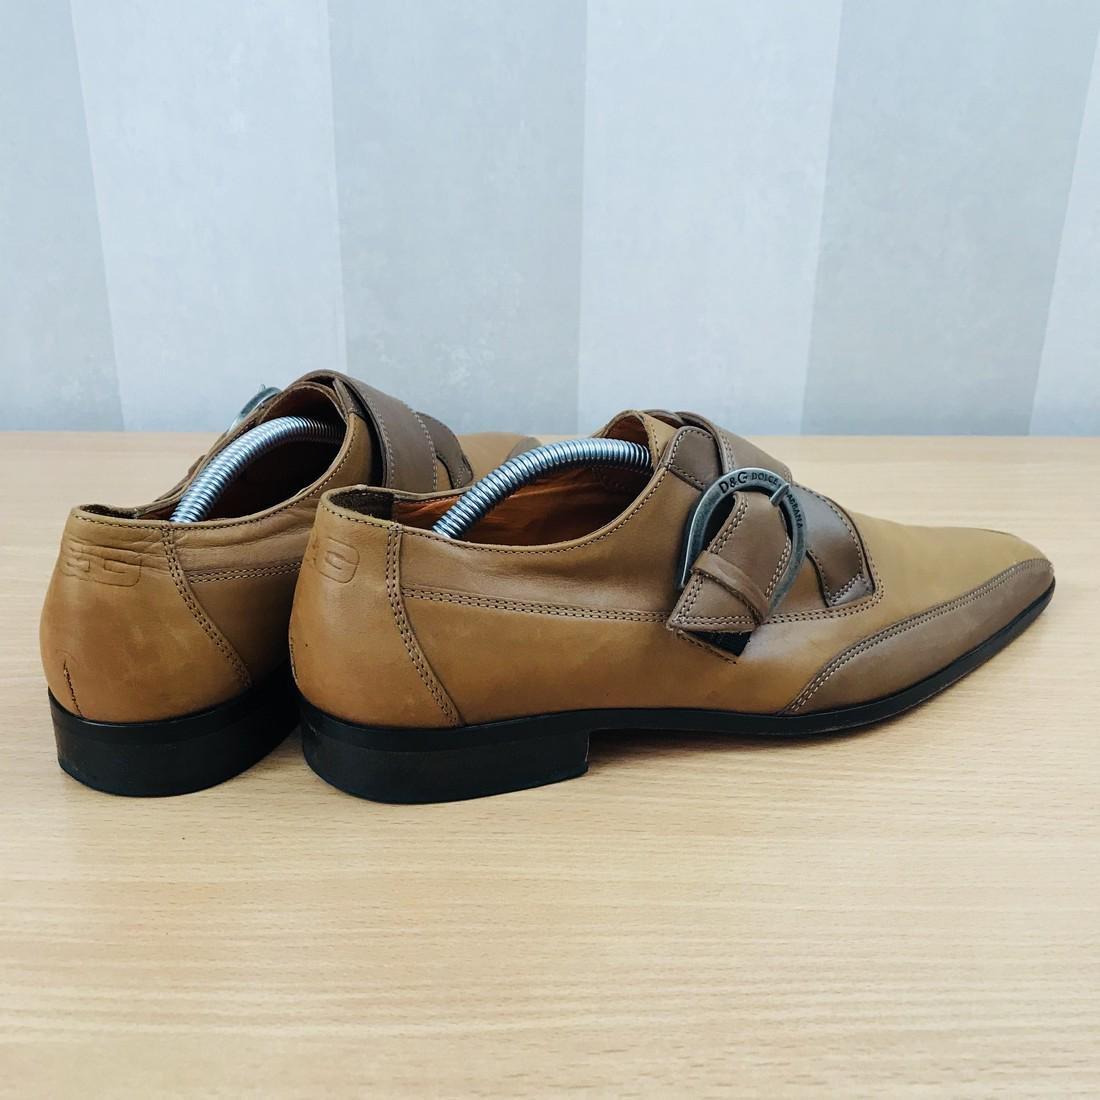 Dolce & Gabbana – Leather Shoes Size EUR 42 UK 8.5 US 9 - 6